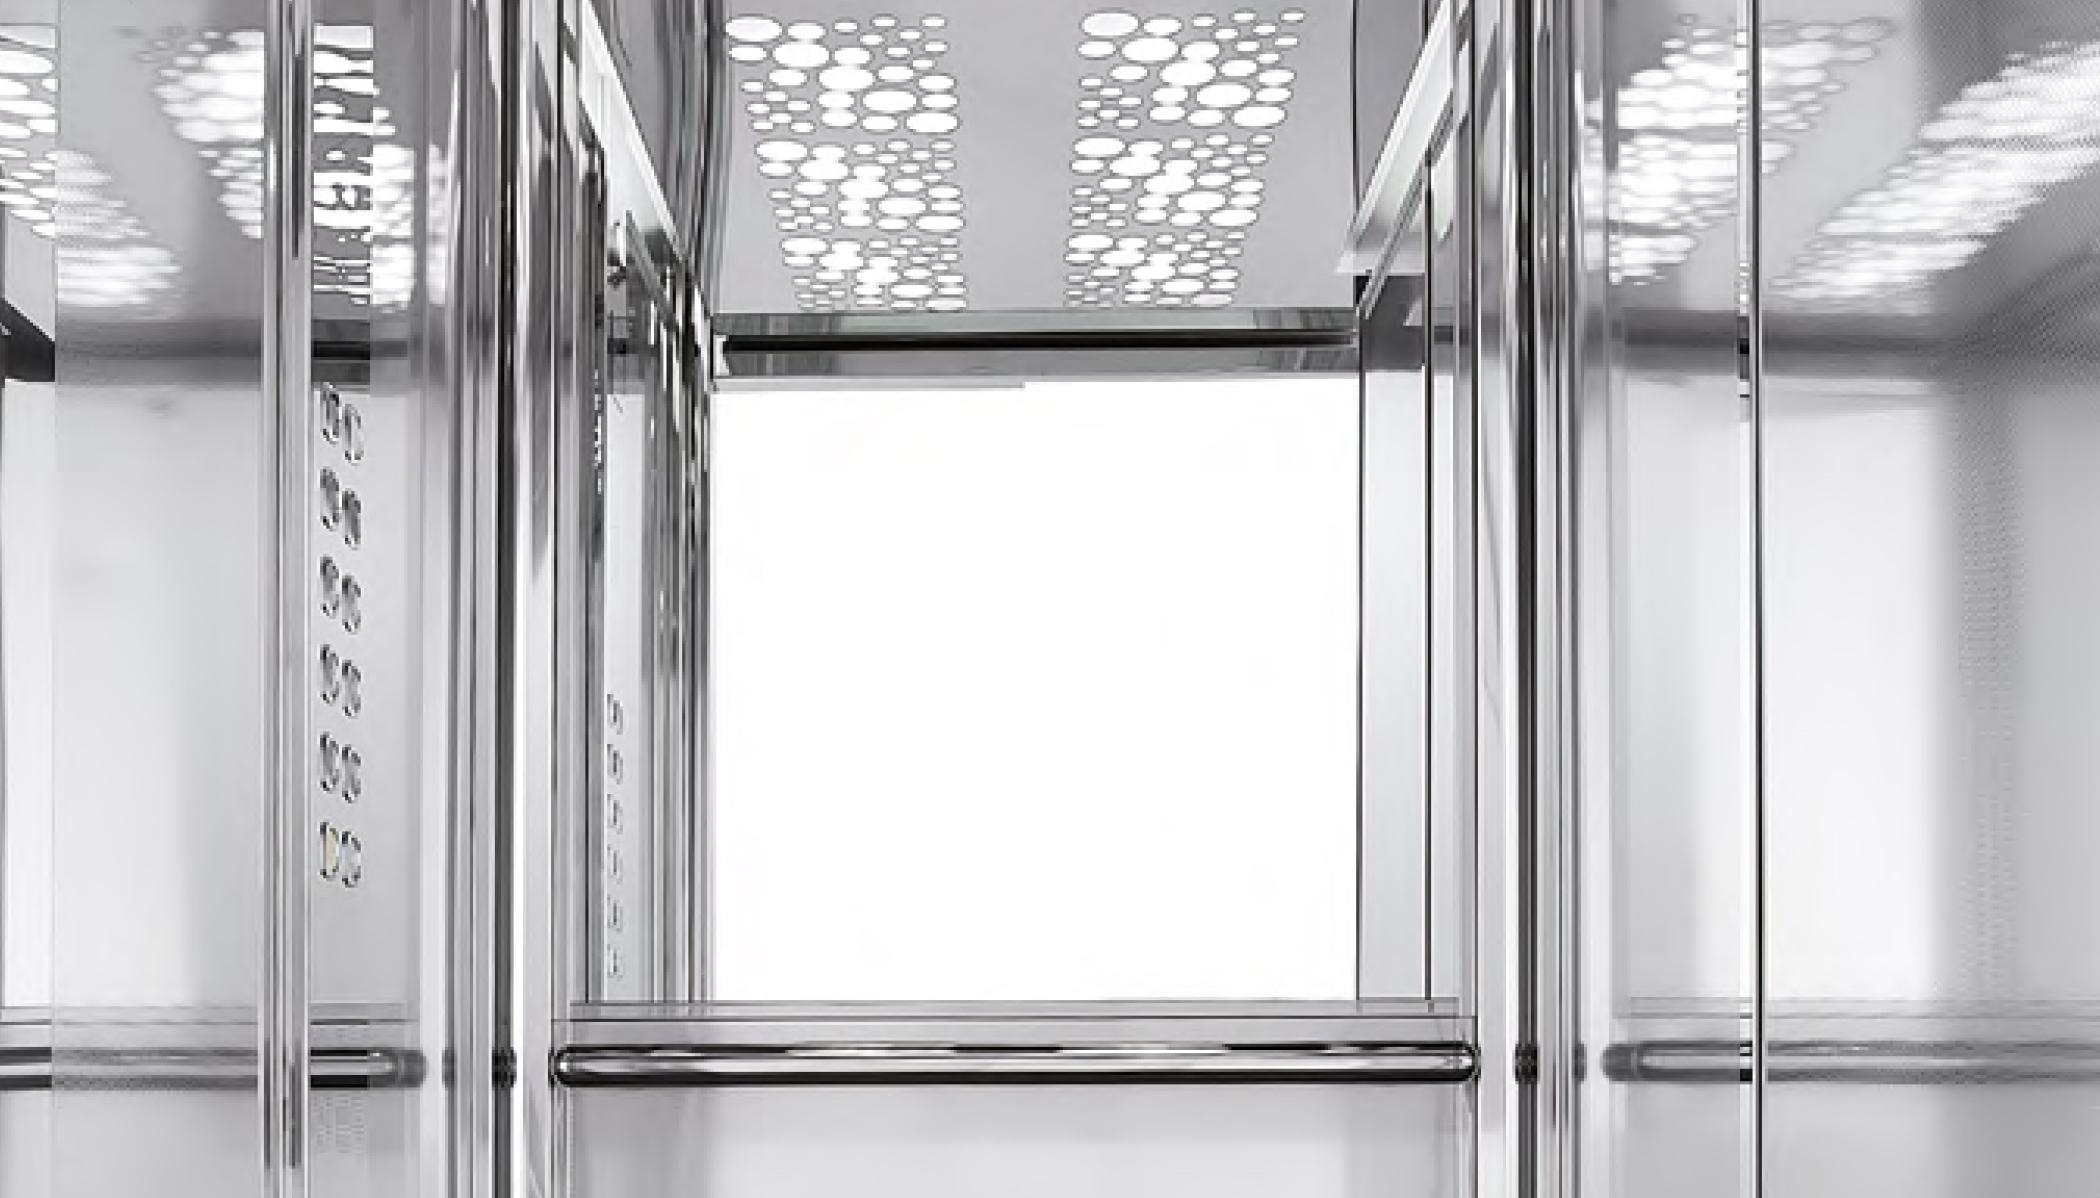 dda lifts for commercial buildings melbourne